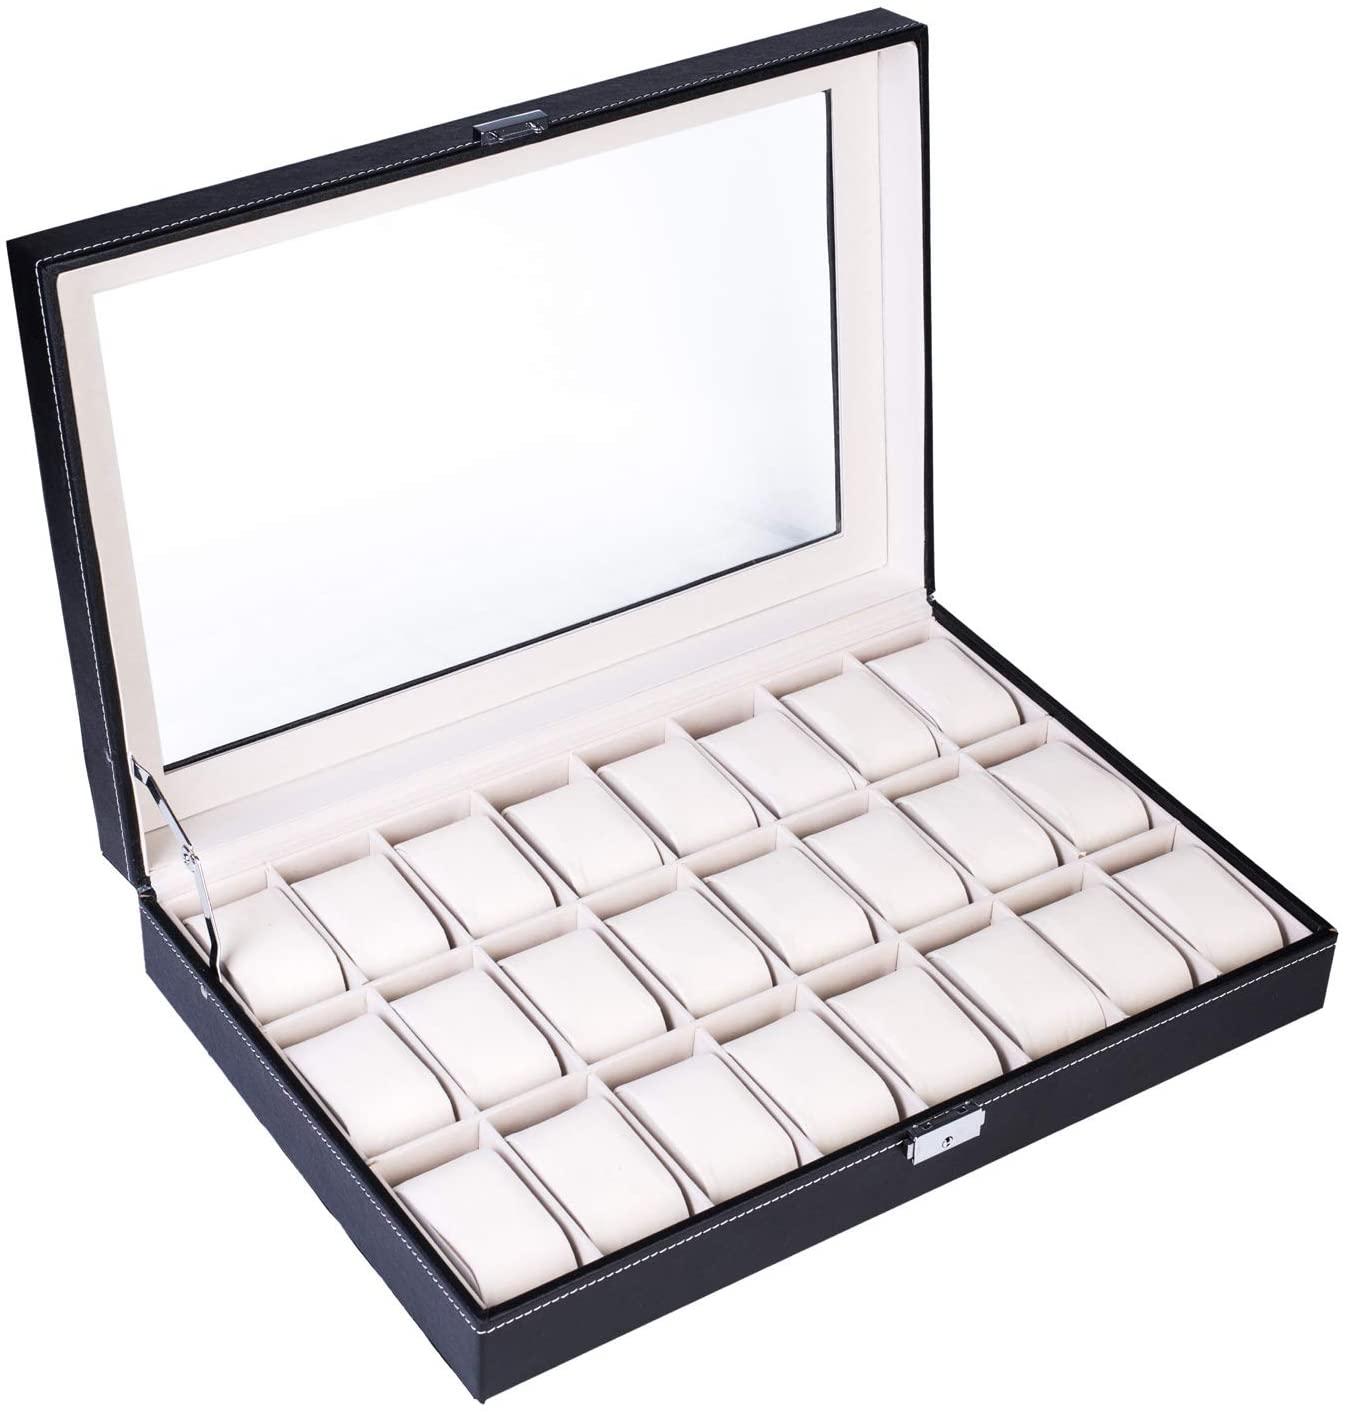 RIYIFER 24 Slots Watch Box, Watch Display Case High-Grade Leather Materia Watch Organizer for Men and Women Birthday Presents - Black